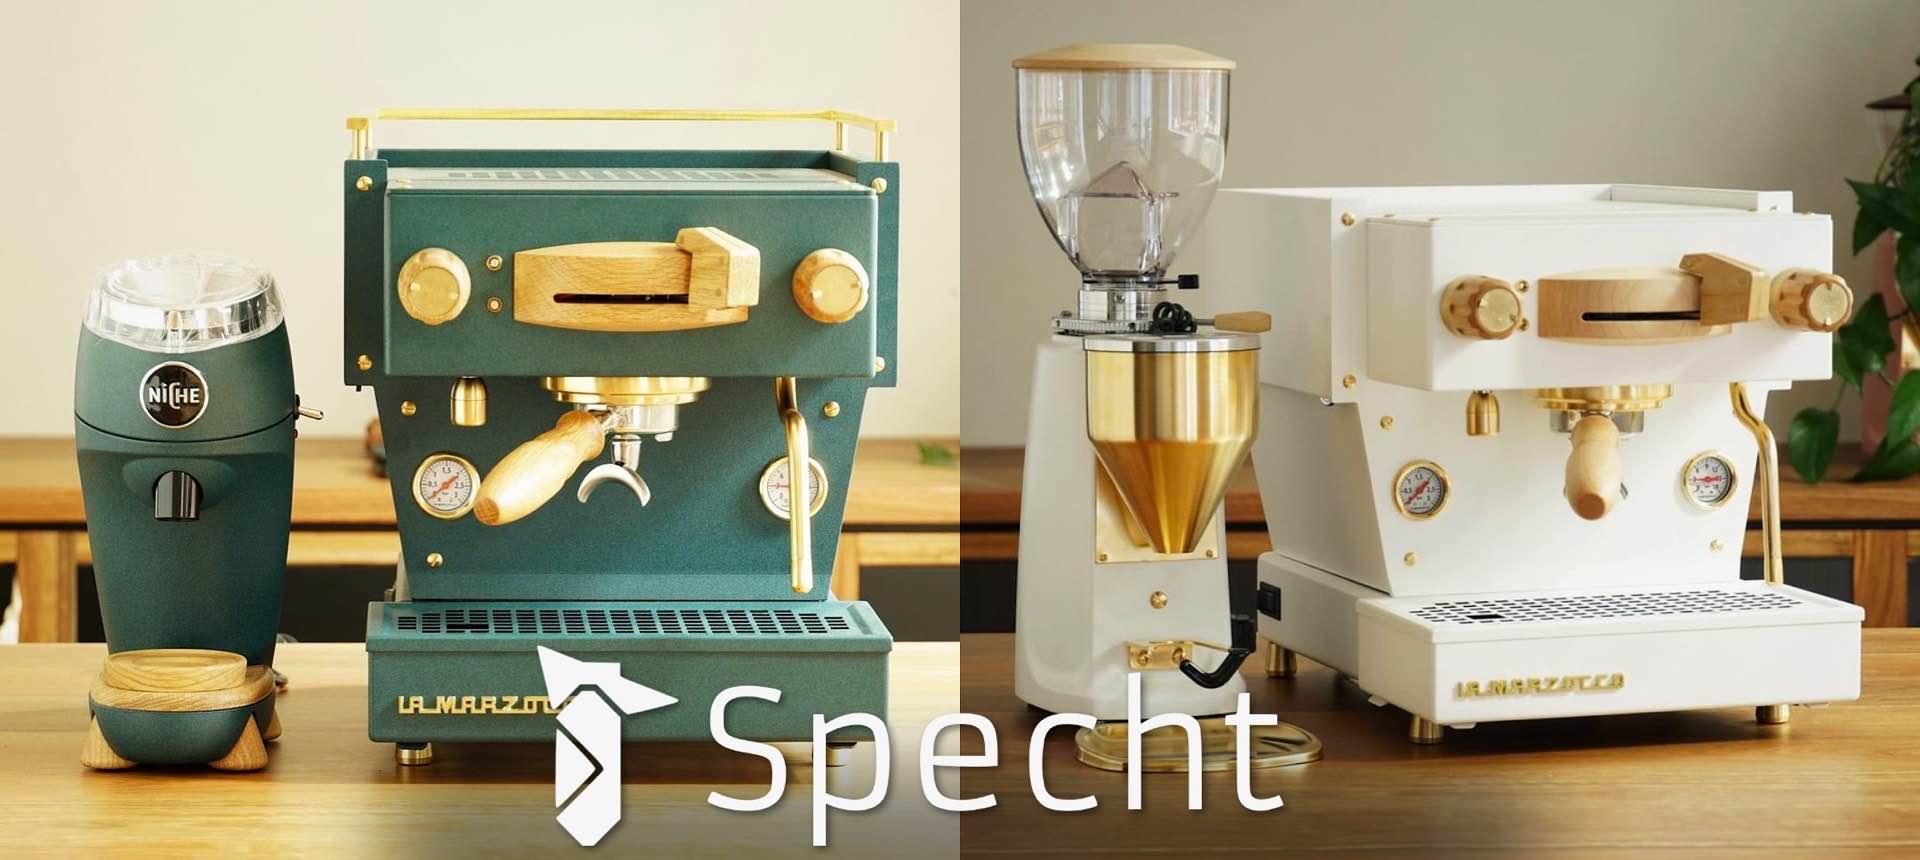 specht-design-premium-espresso-machine-customization